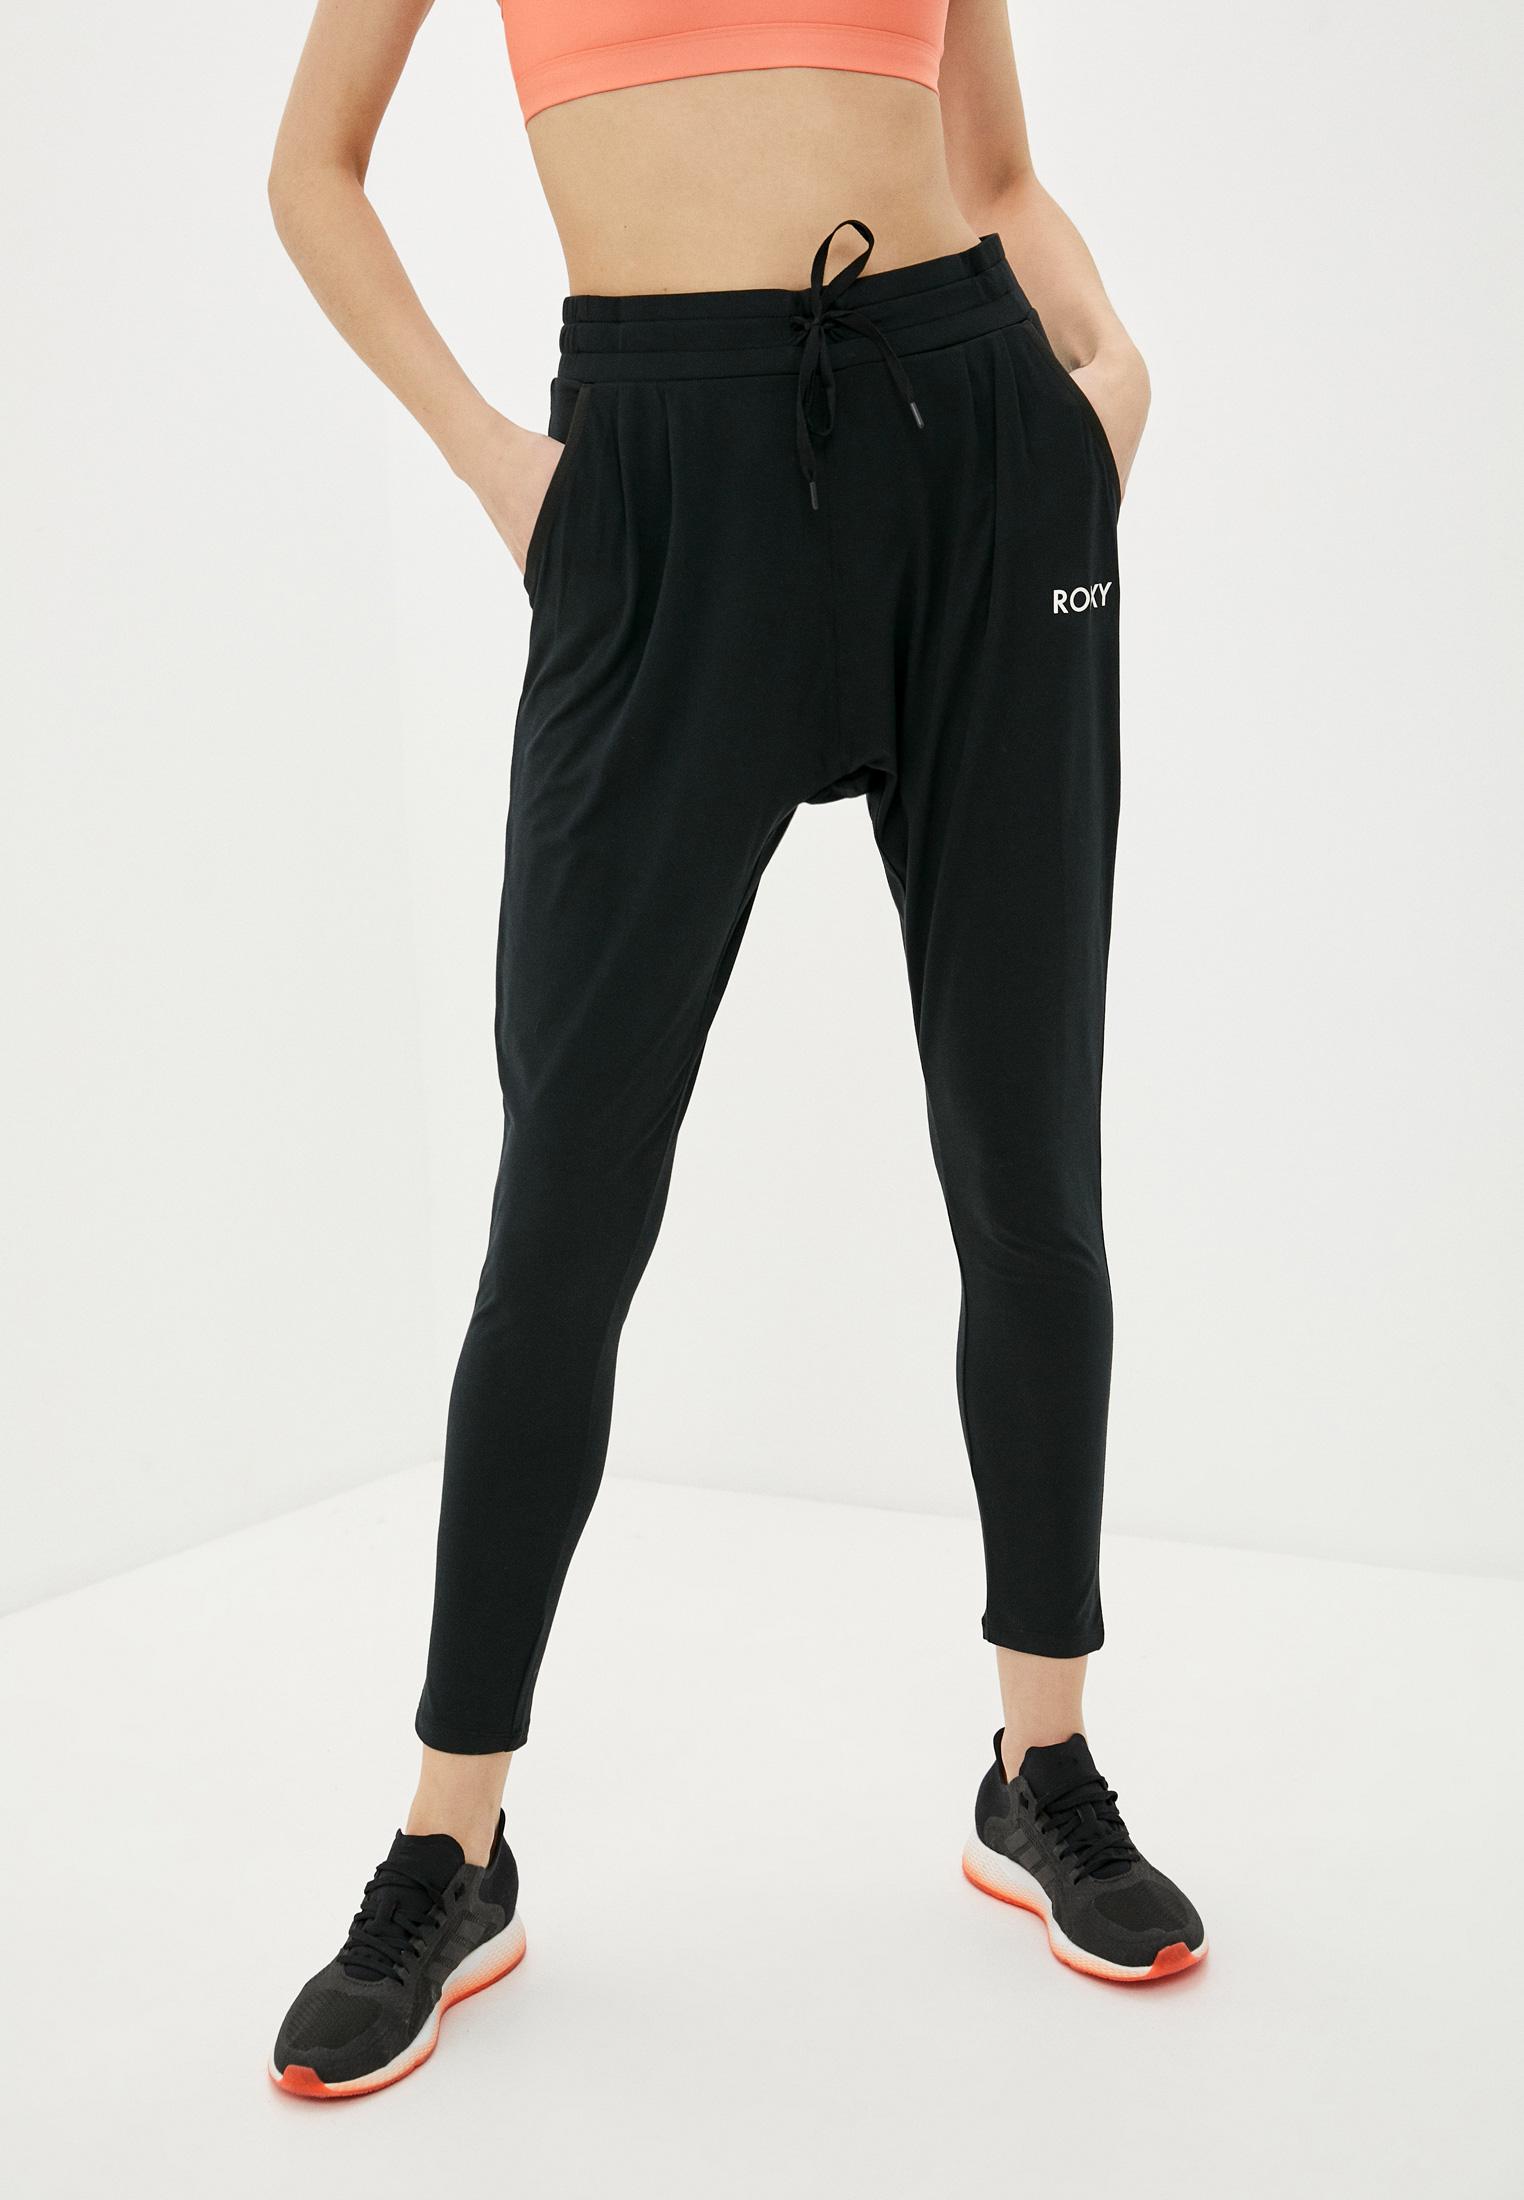 Женские брюки Roxy (Рокси) Брюки спортивные Roxy